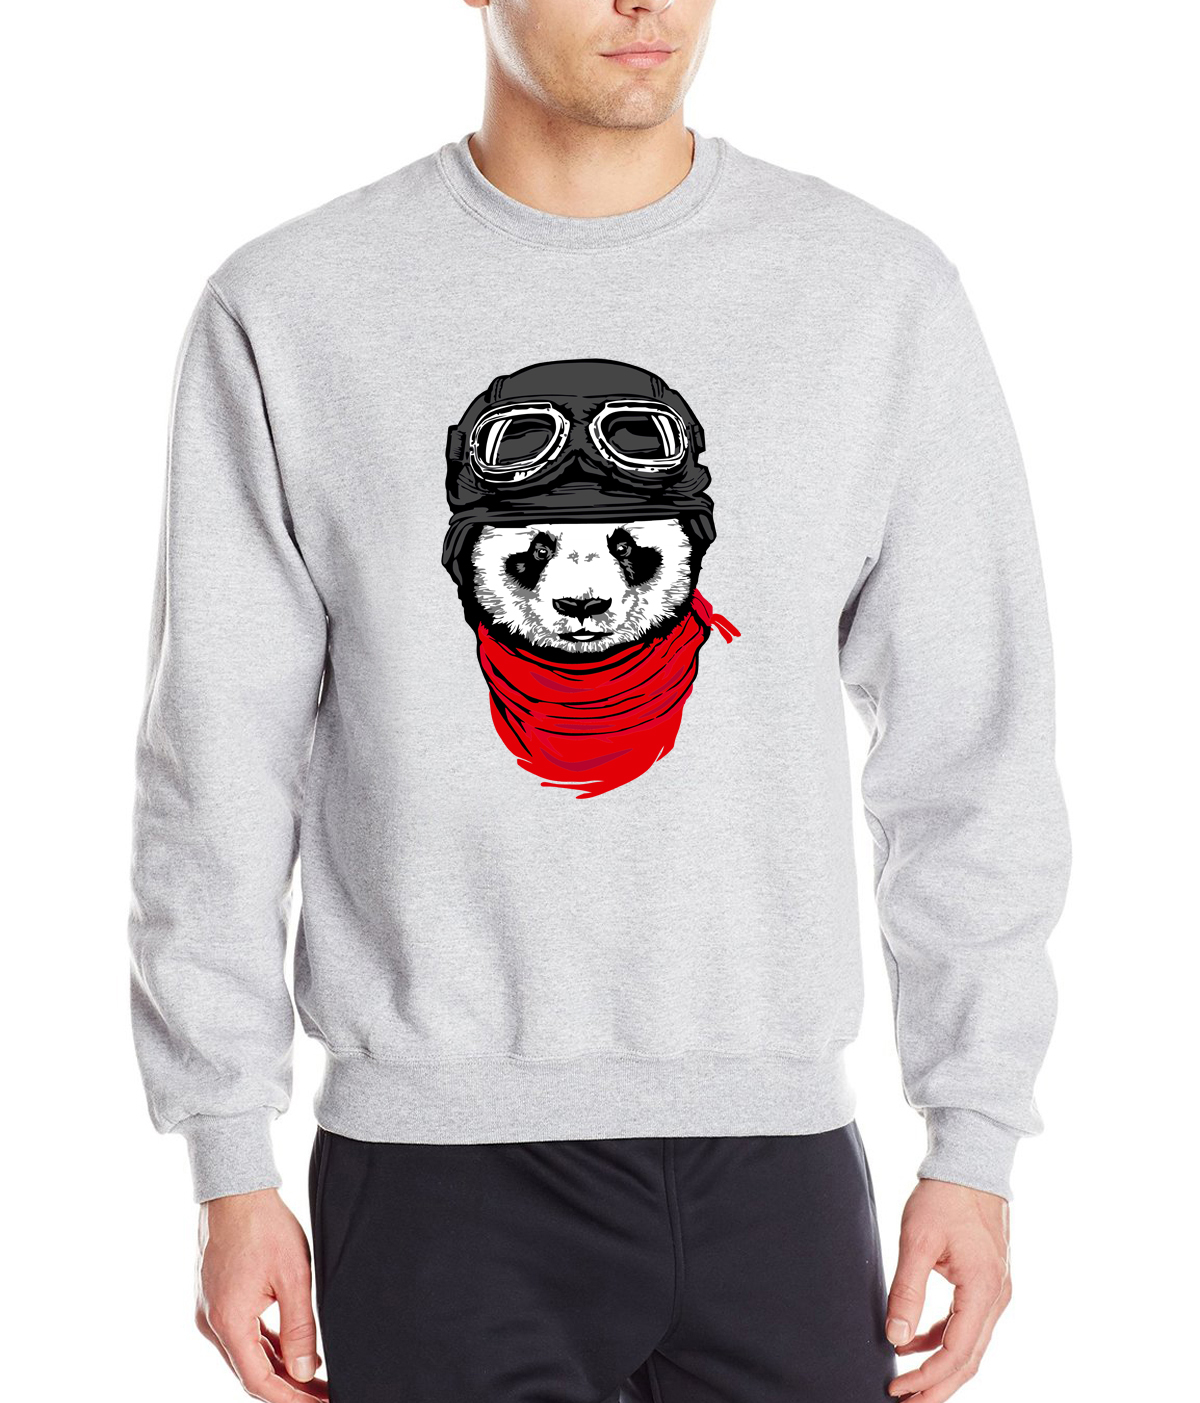 Men new  sweatshirt The Adventurer Cat Panda print kawaii hoodies 2019 autumn fashion brand tracksuits hip-hop tops mma